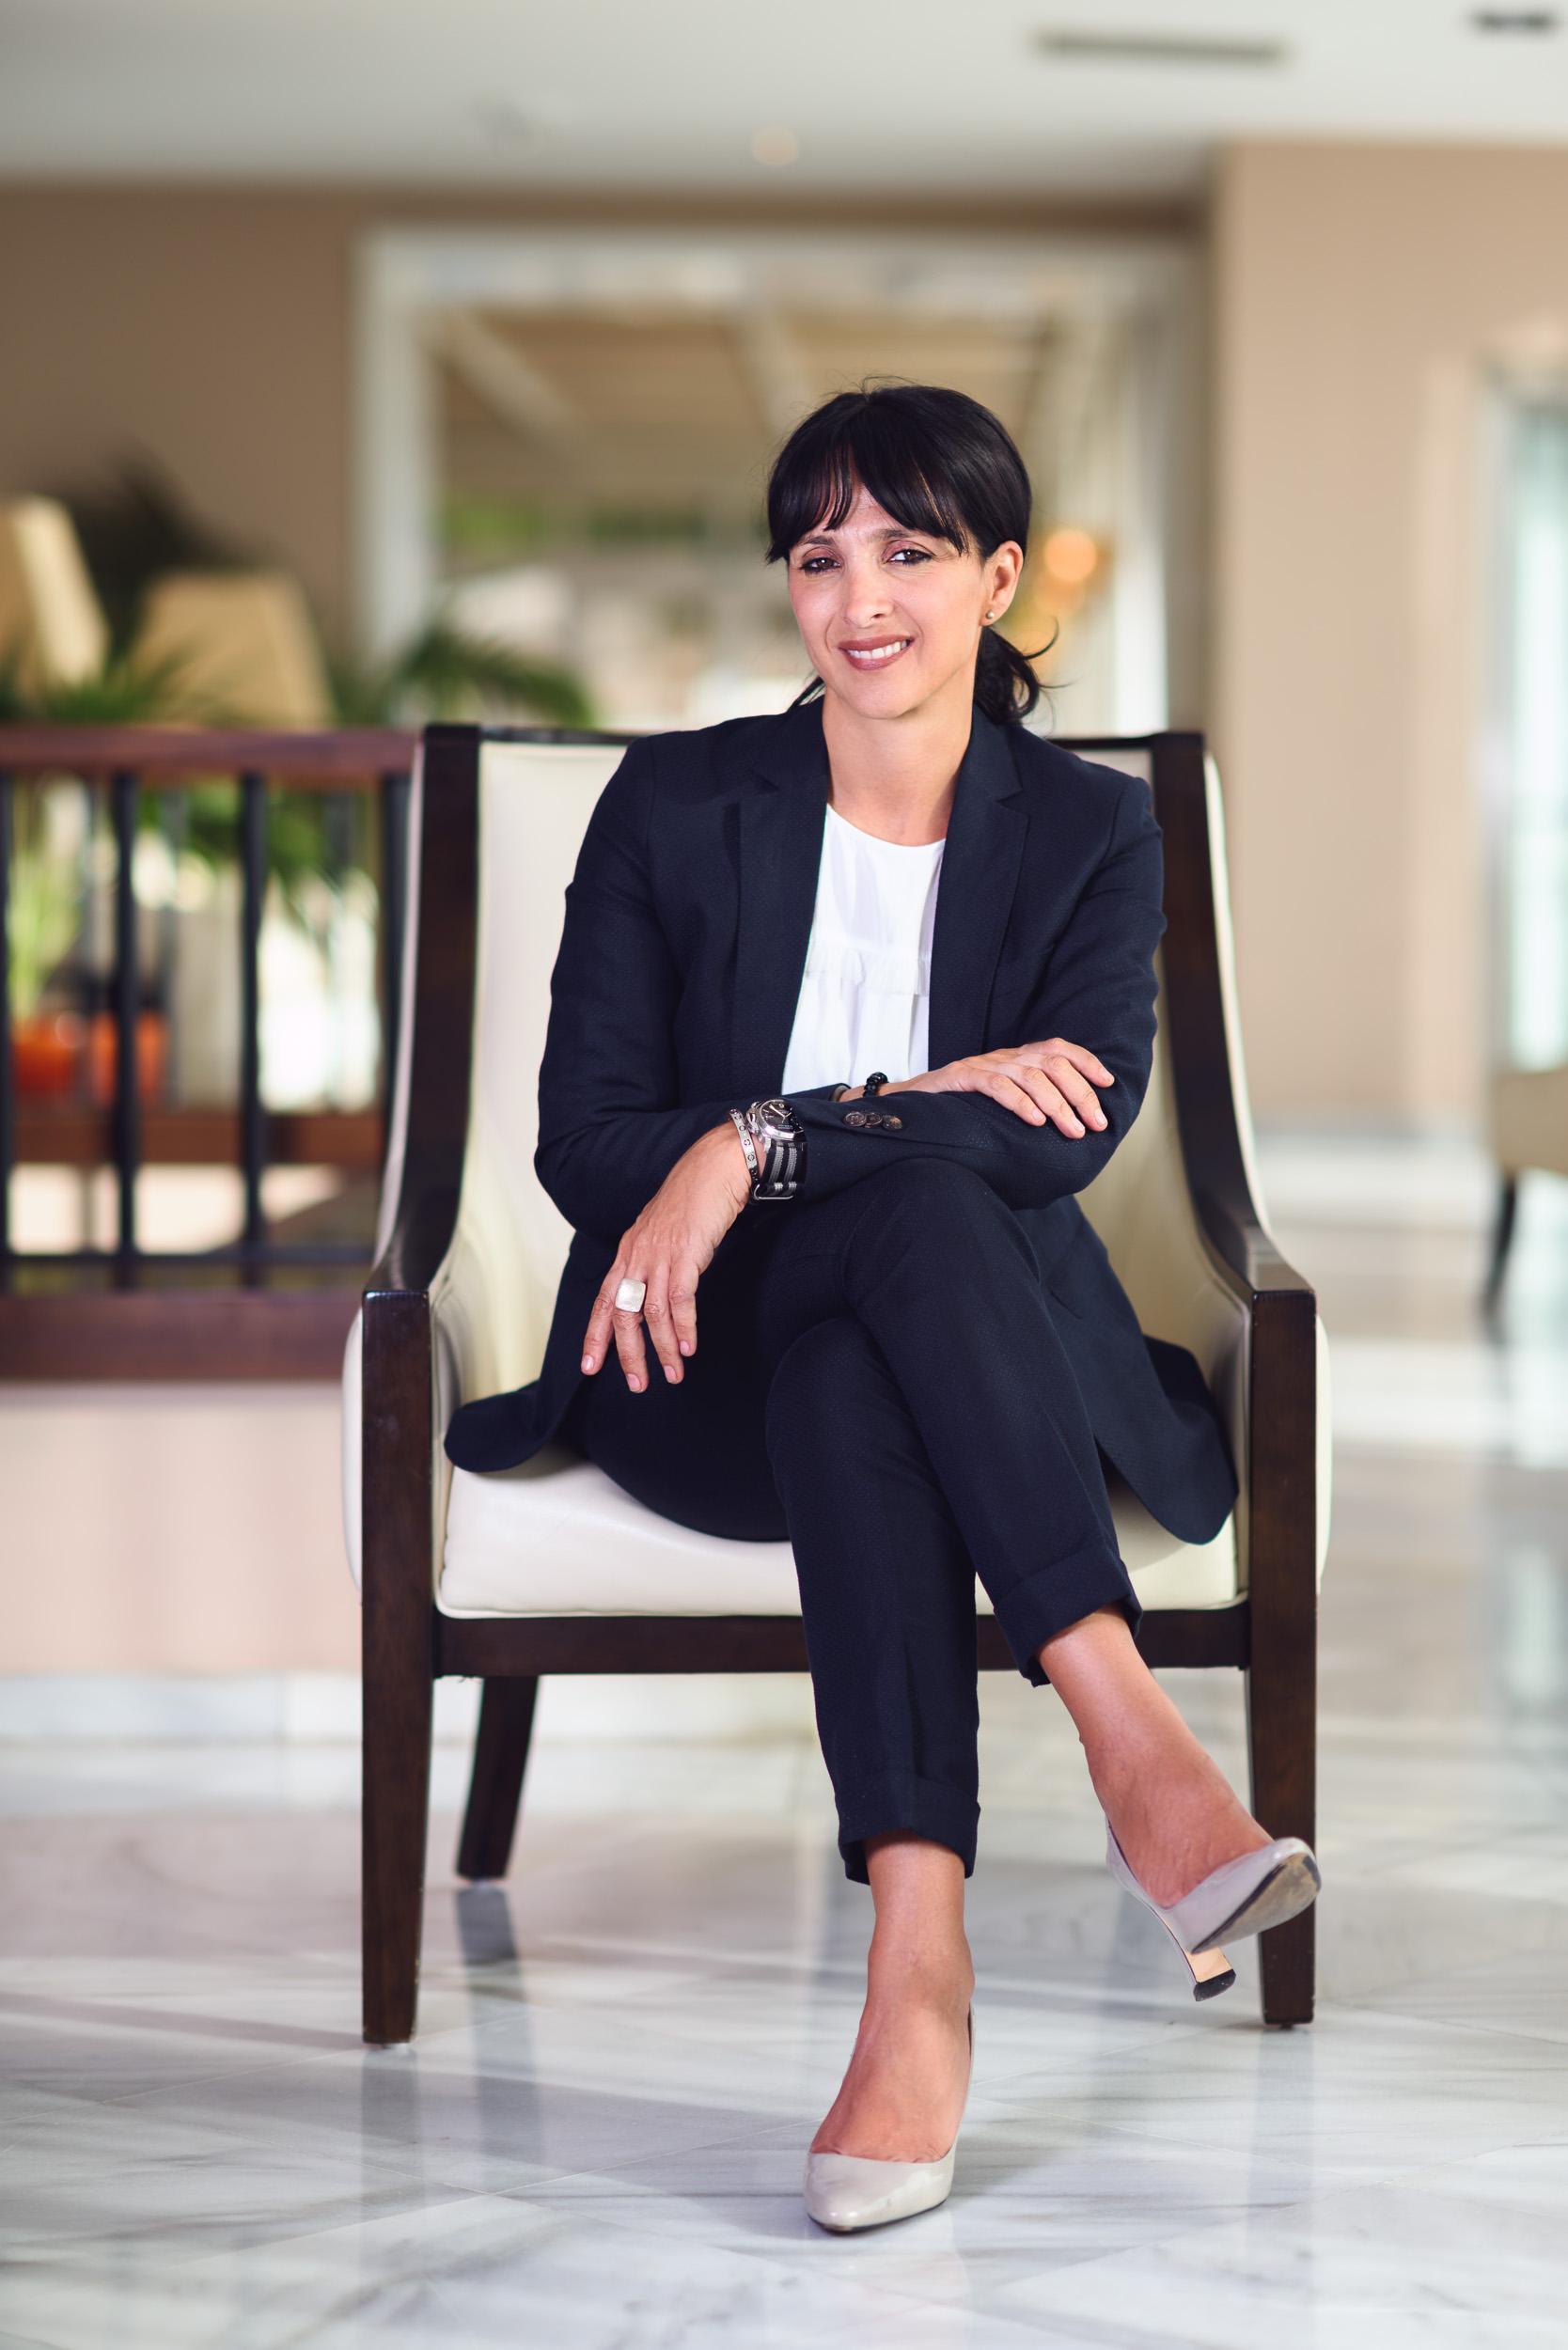 Marlene Hassan Nahon - Together Gibraltar Party LeaderRead Marlene Hassan Nahon's bio.